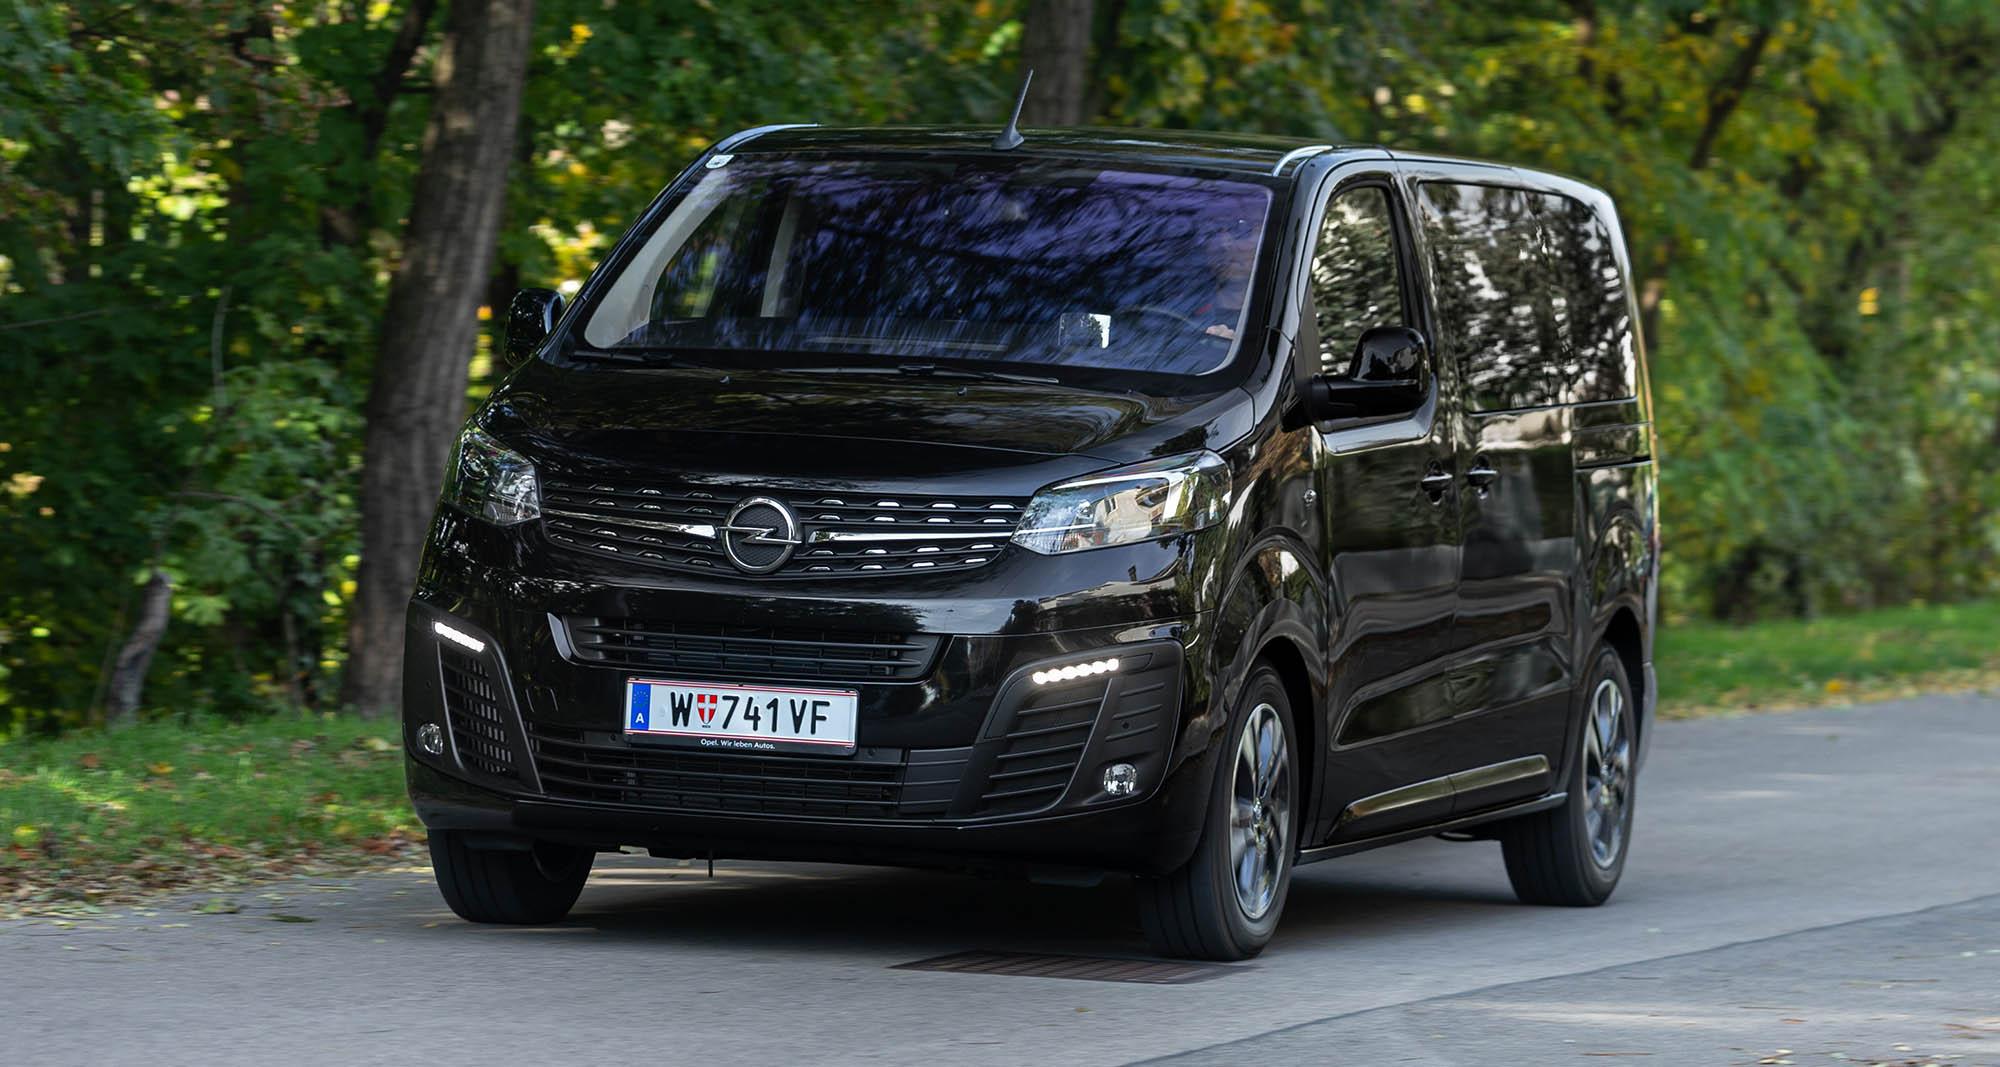 Test Opel Zafira Life 2 0 Cdti Aut Business Innovation M Alles Auto